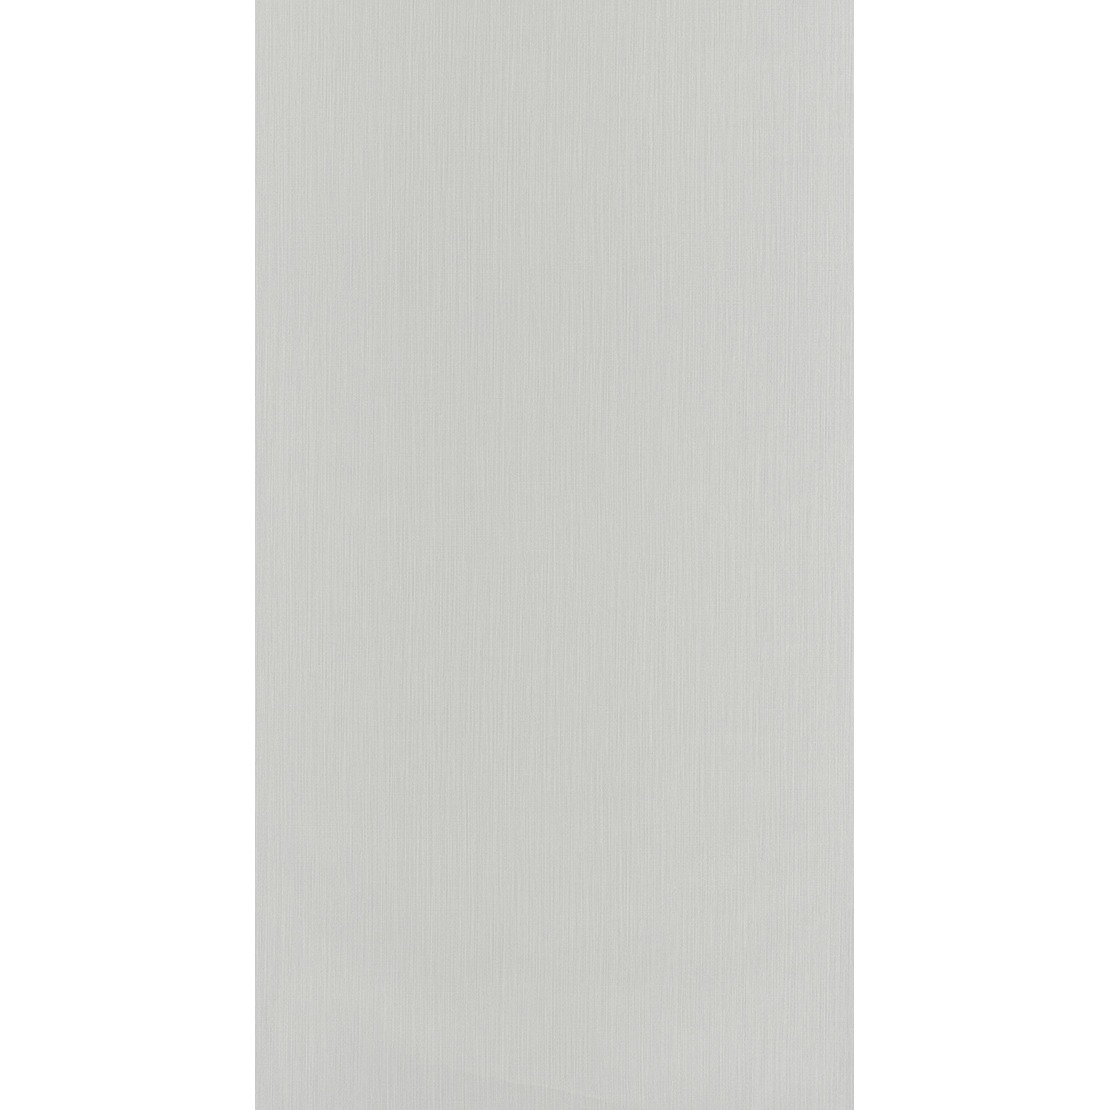 Обои Casadeco Signature 0,53 м. (Касадеко) SIGN82081230